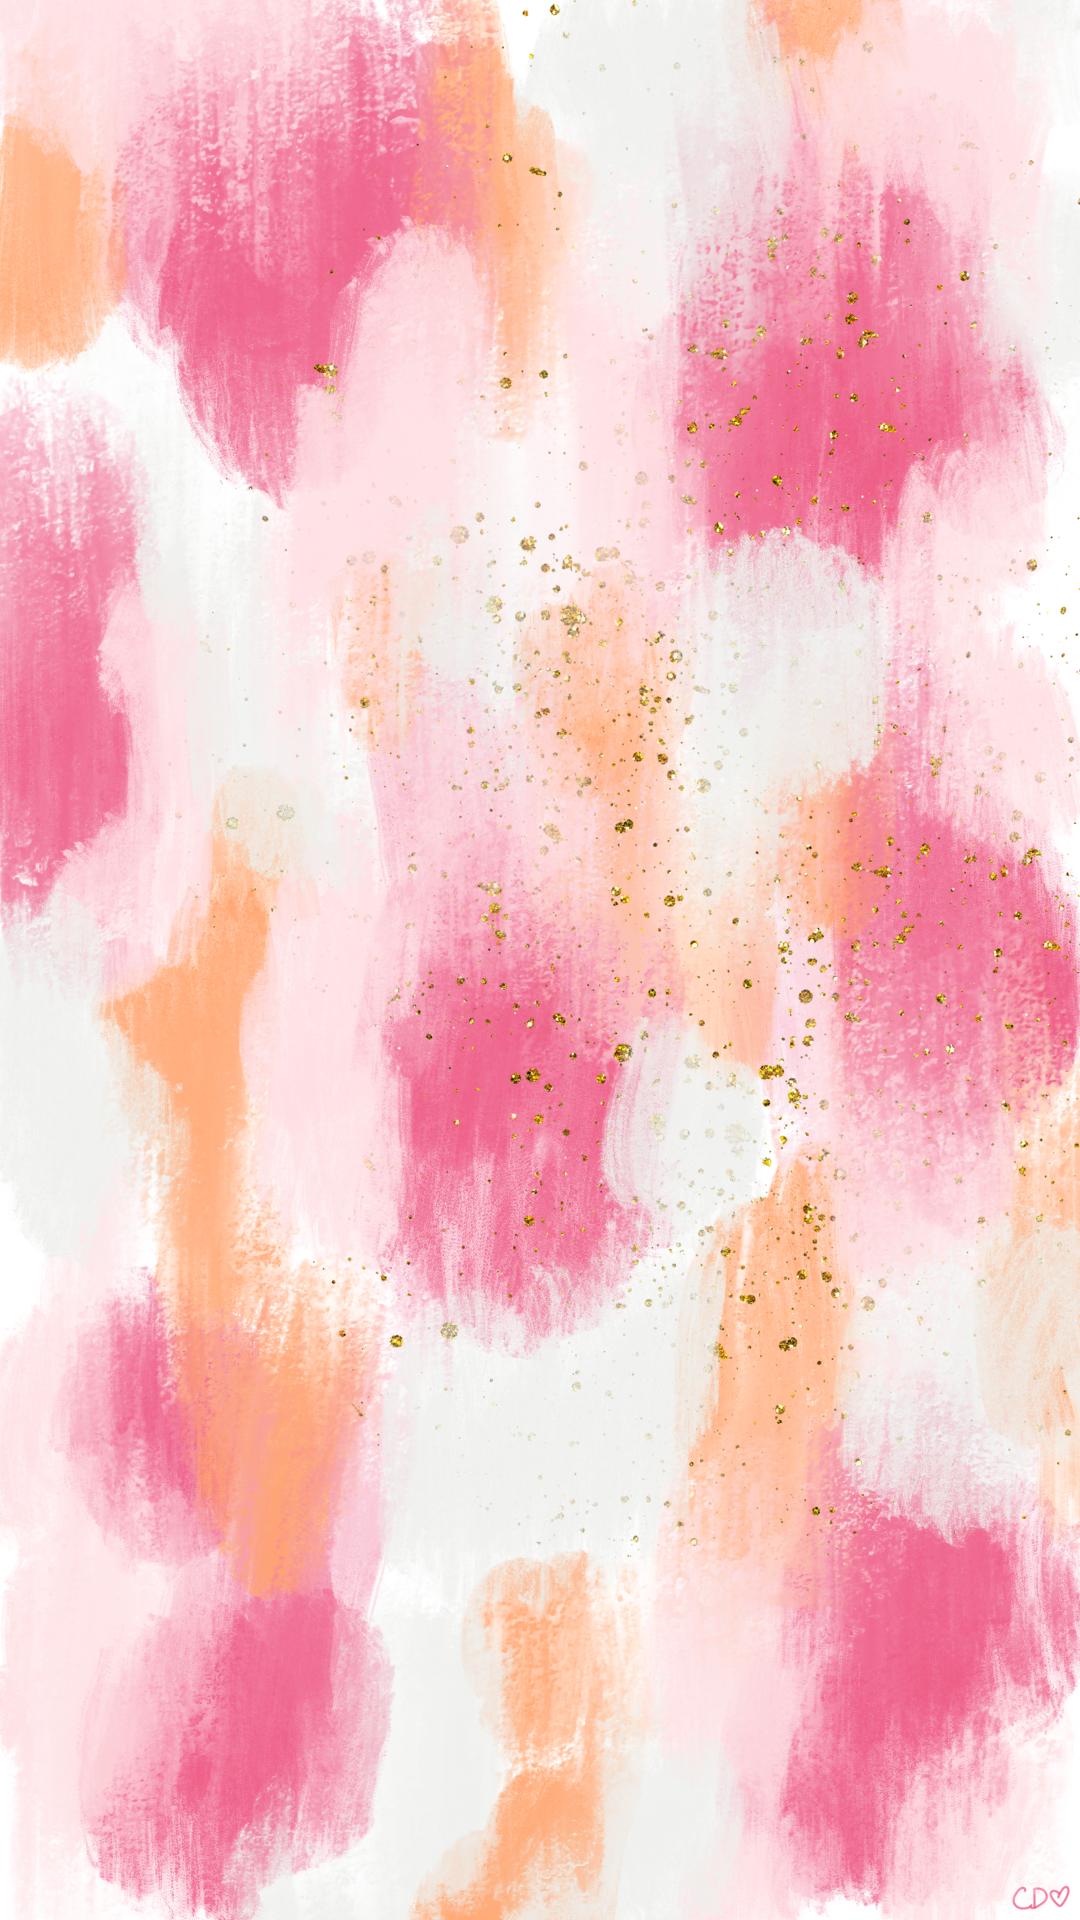 Callie Danielle Art Artsy Background Iphone Background Wallpaper Ipad Wallpaper